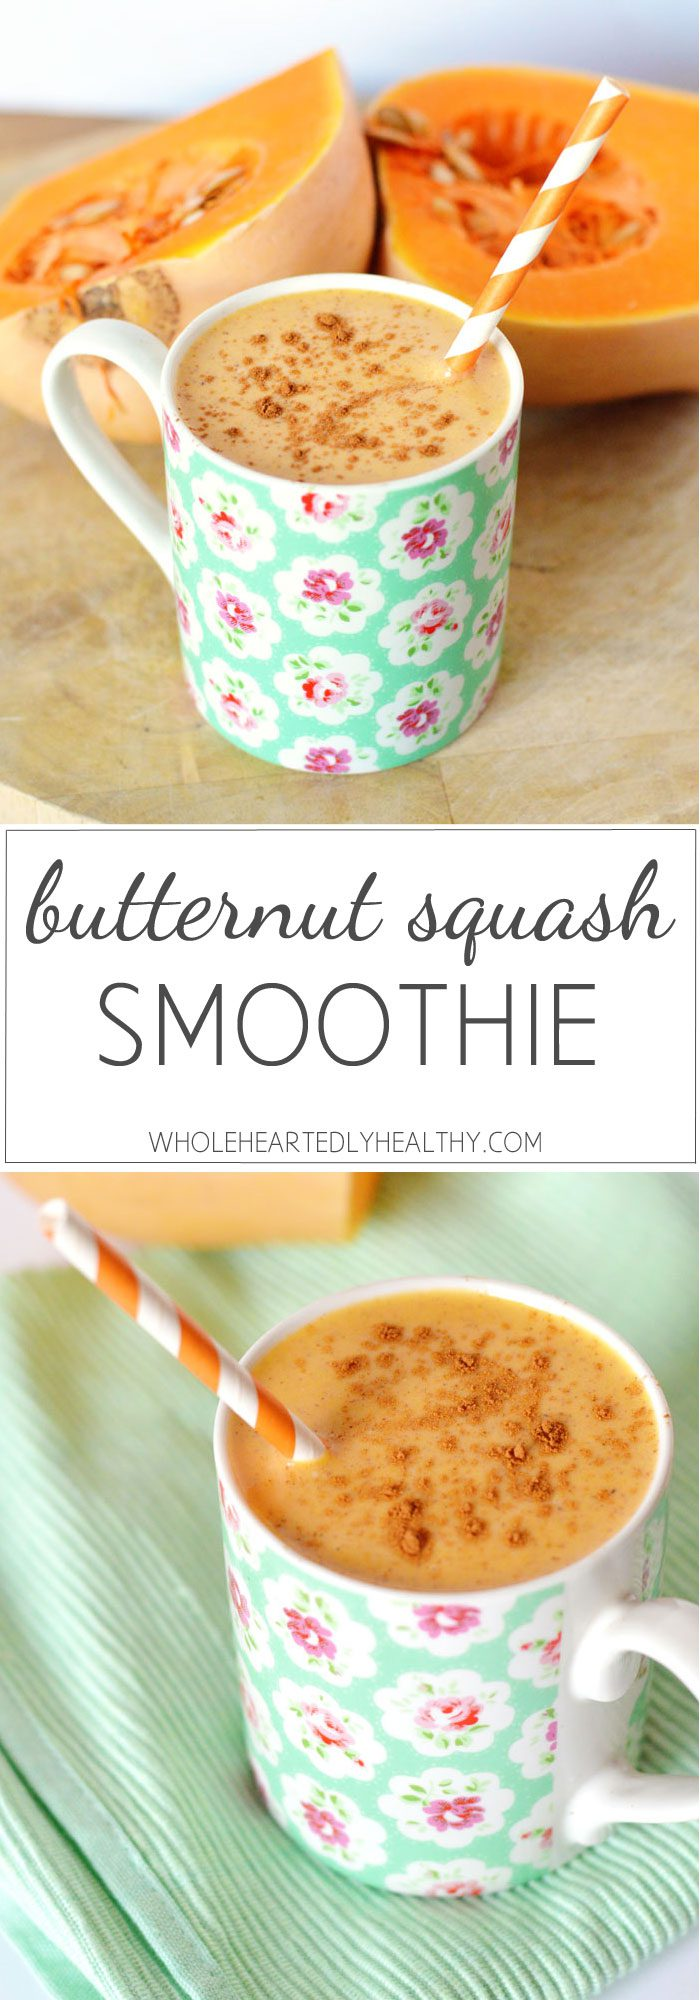 Butternut squash smoothie recipe